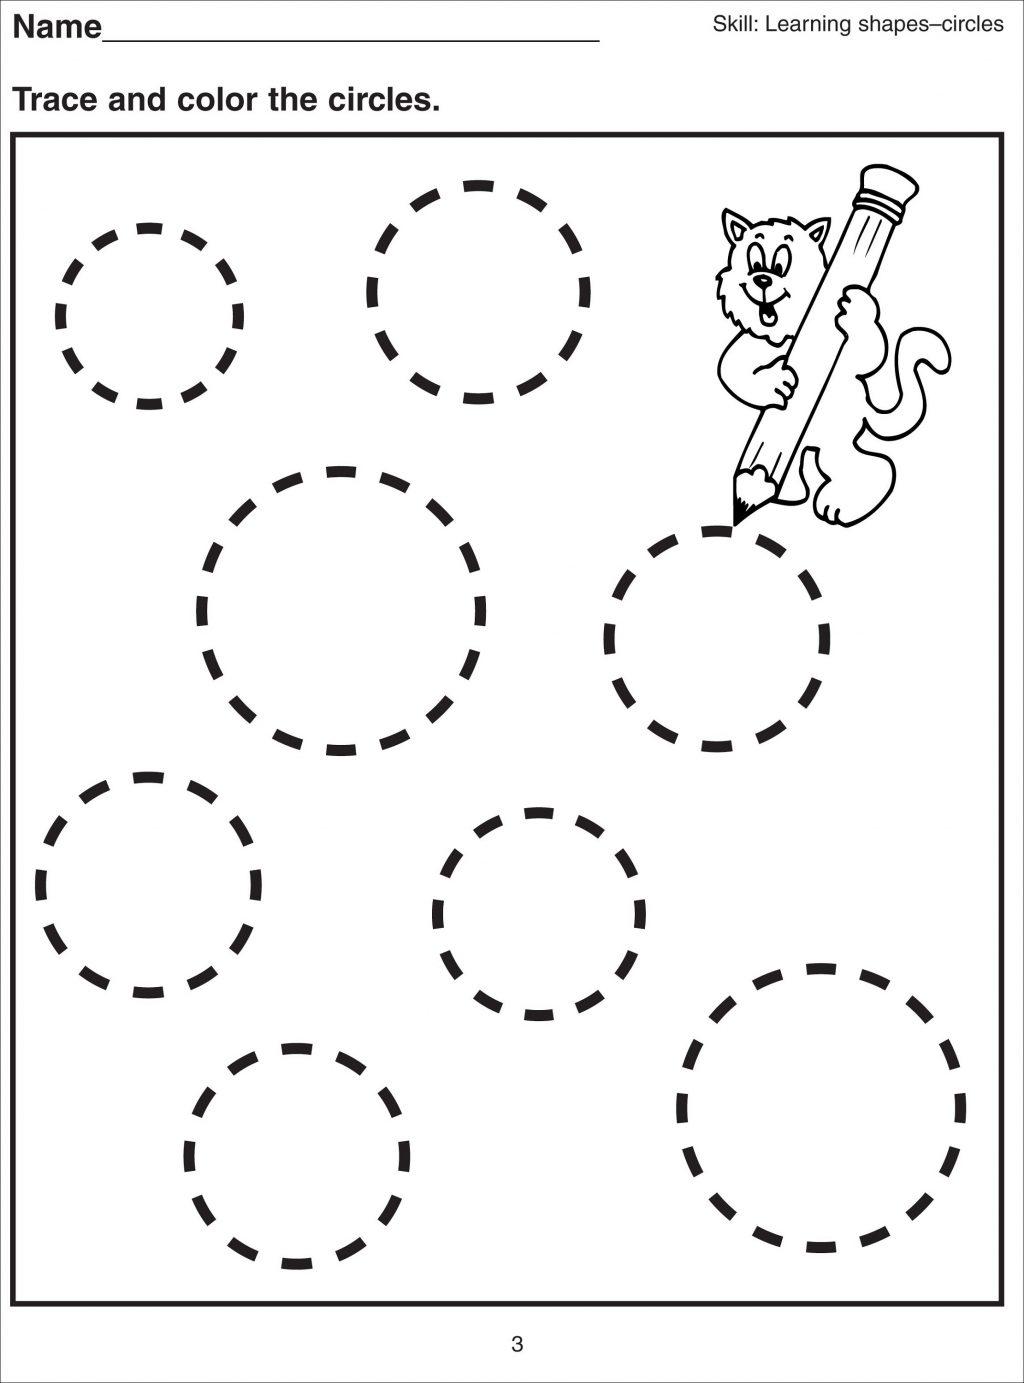 Kindergarten  Basic Shapes Worksheets Circle Forrten Math Sorting